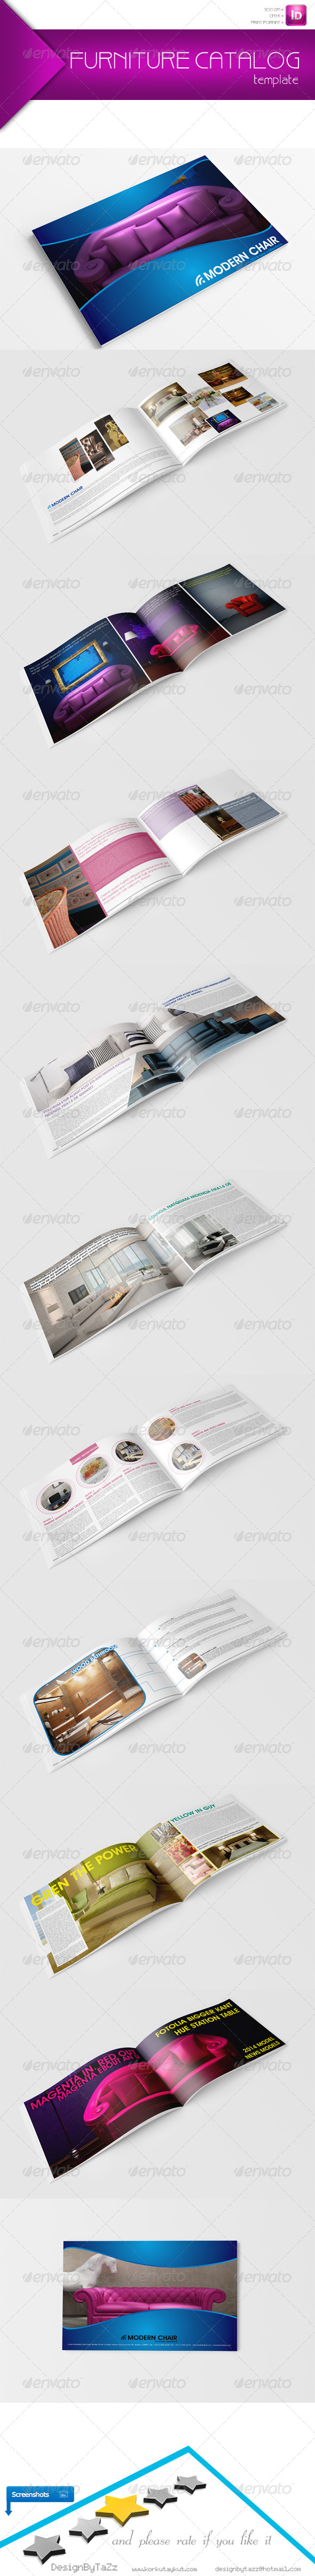 GraphicRiver New Furniture Catalog Template 5184434